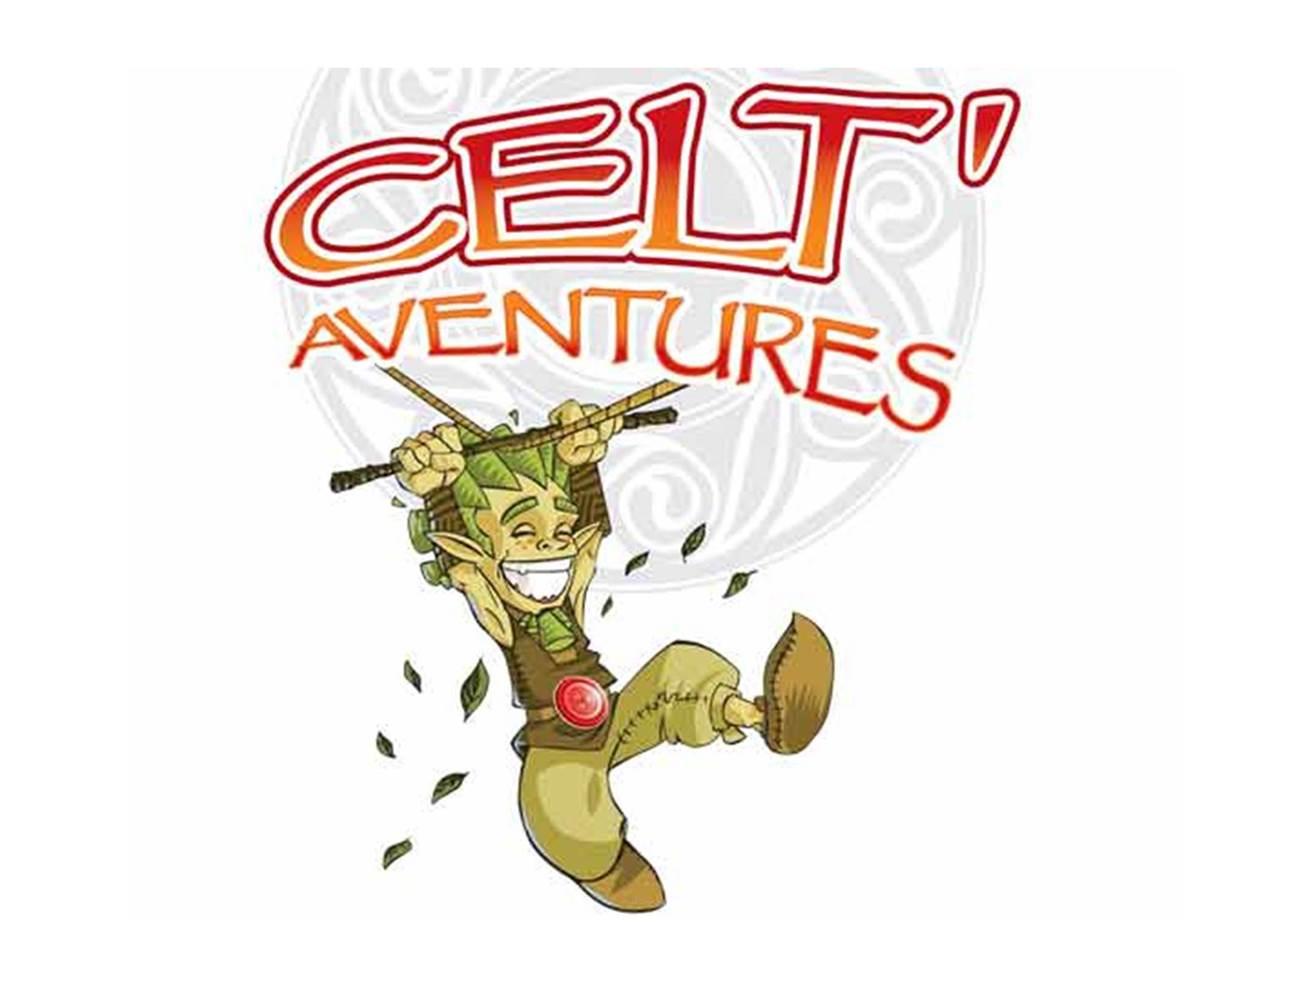 Logo-CeltAventures-Sarzeau-Presqu'île-de-Rhuys-Golfe-du-Morbihan-Bretagne sud © CeltAventures